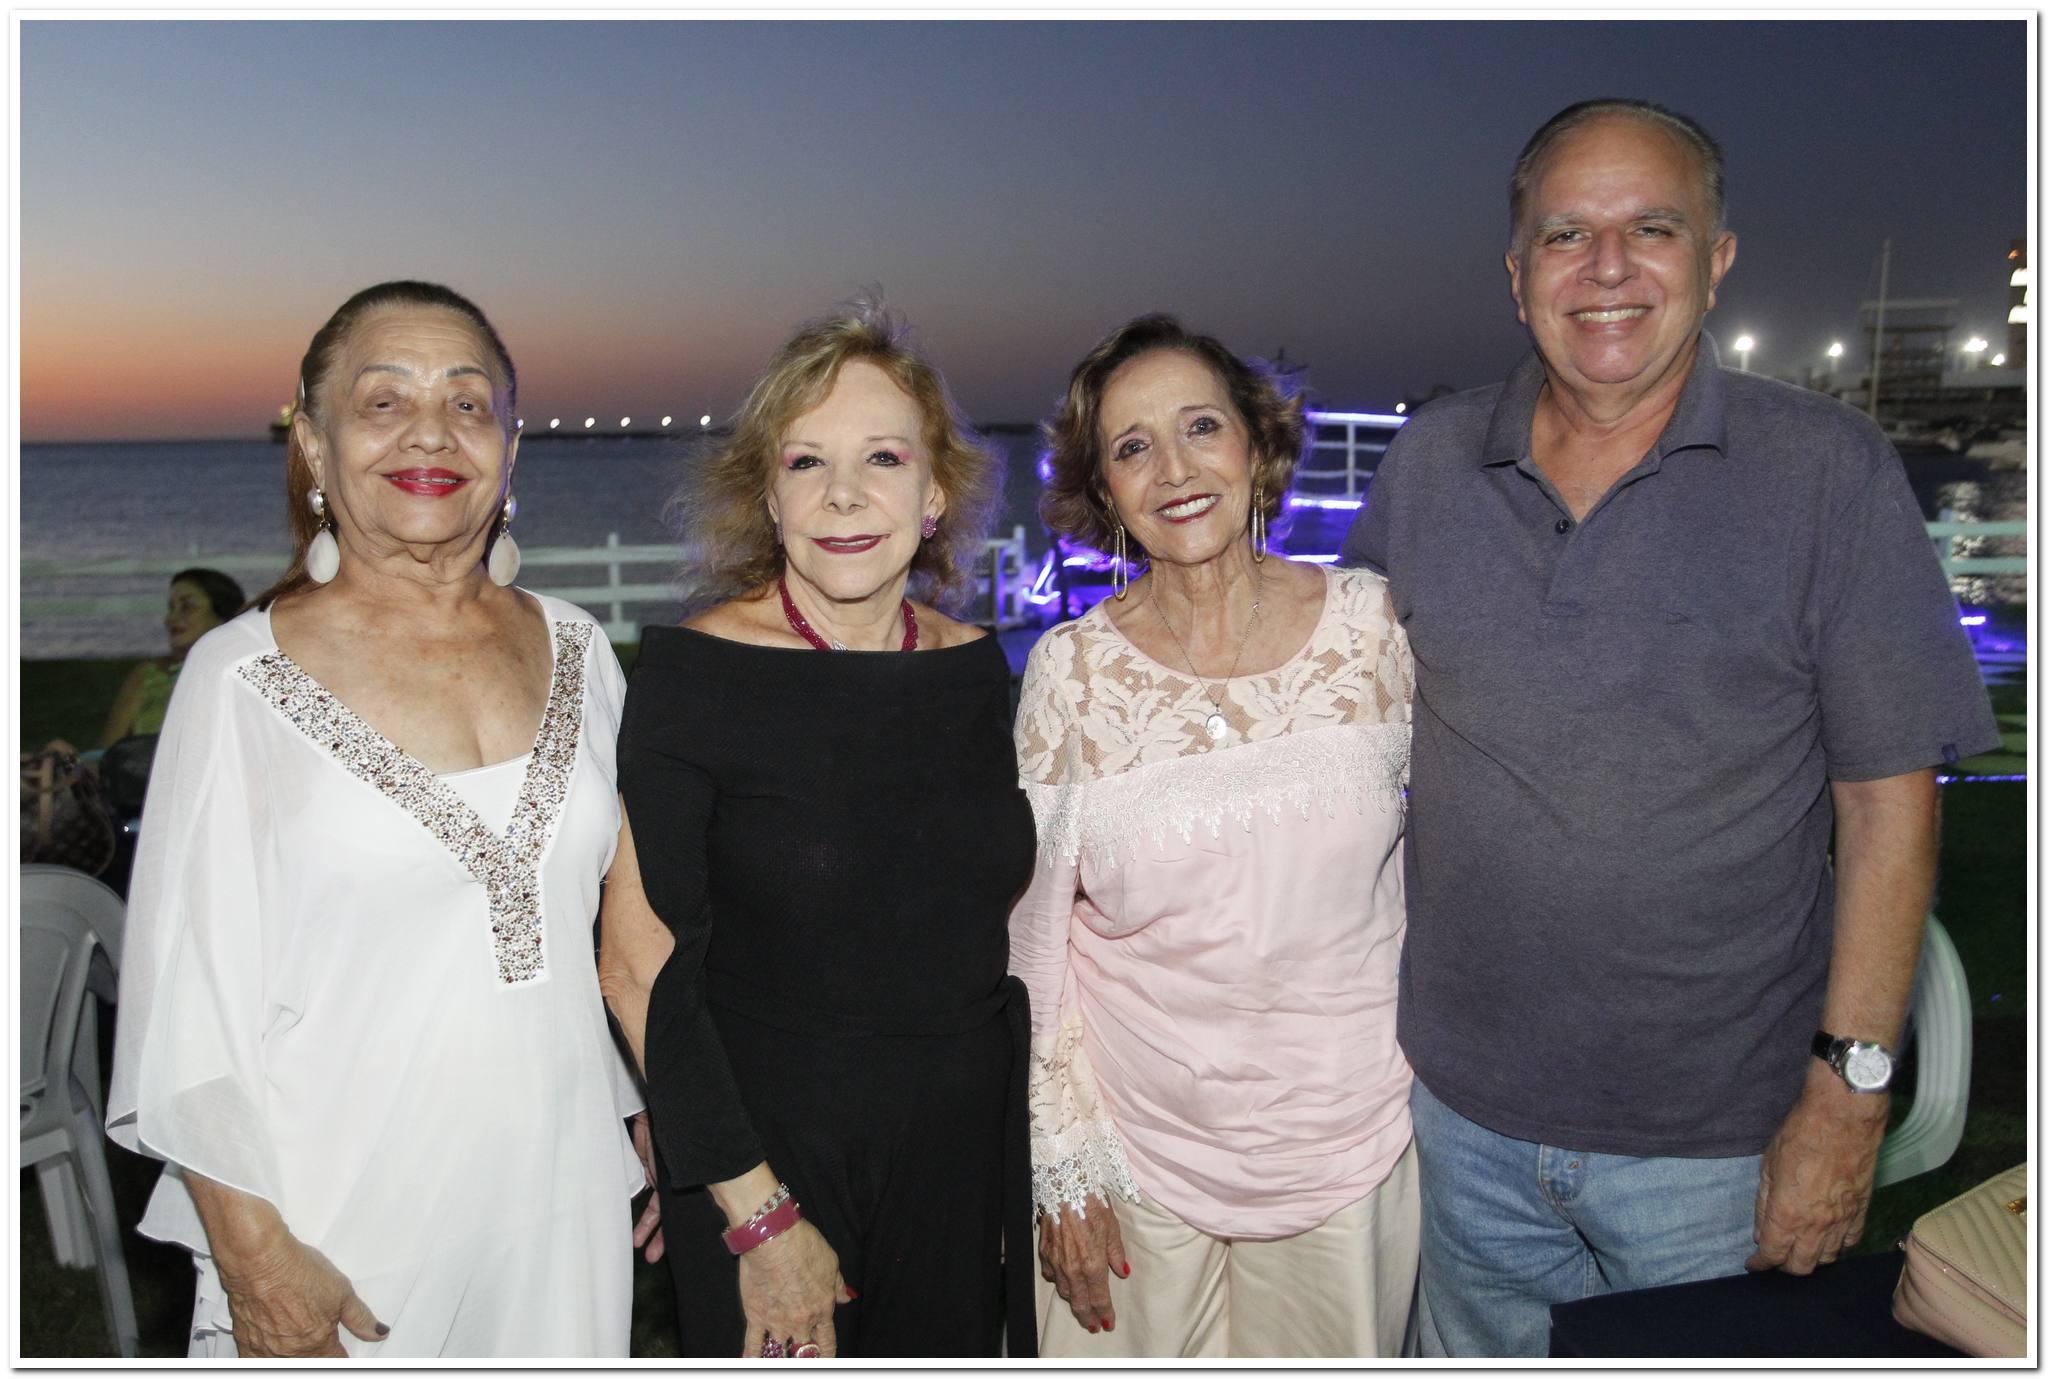 Perpetua Pinto, Moema Guilhon, Maria Jose E Livio Costa